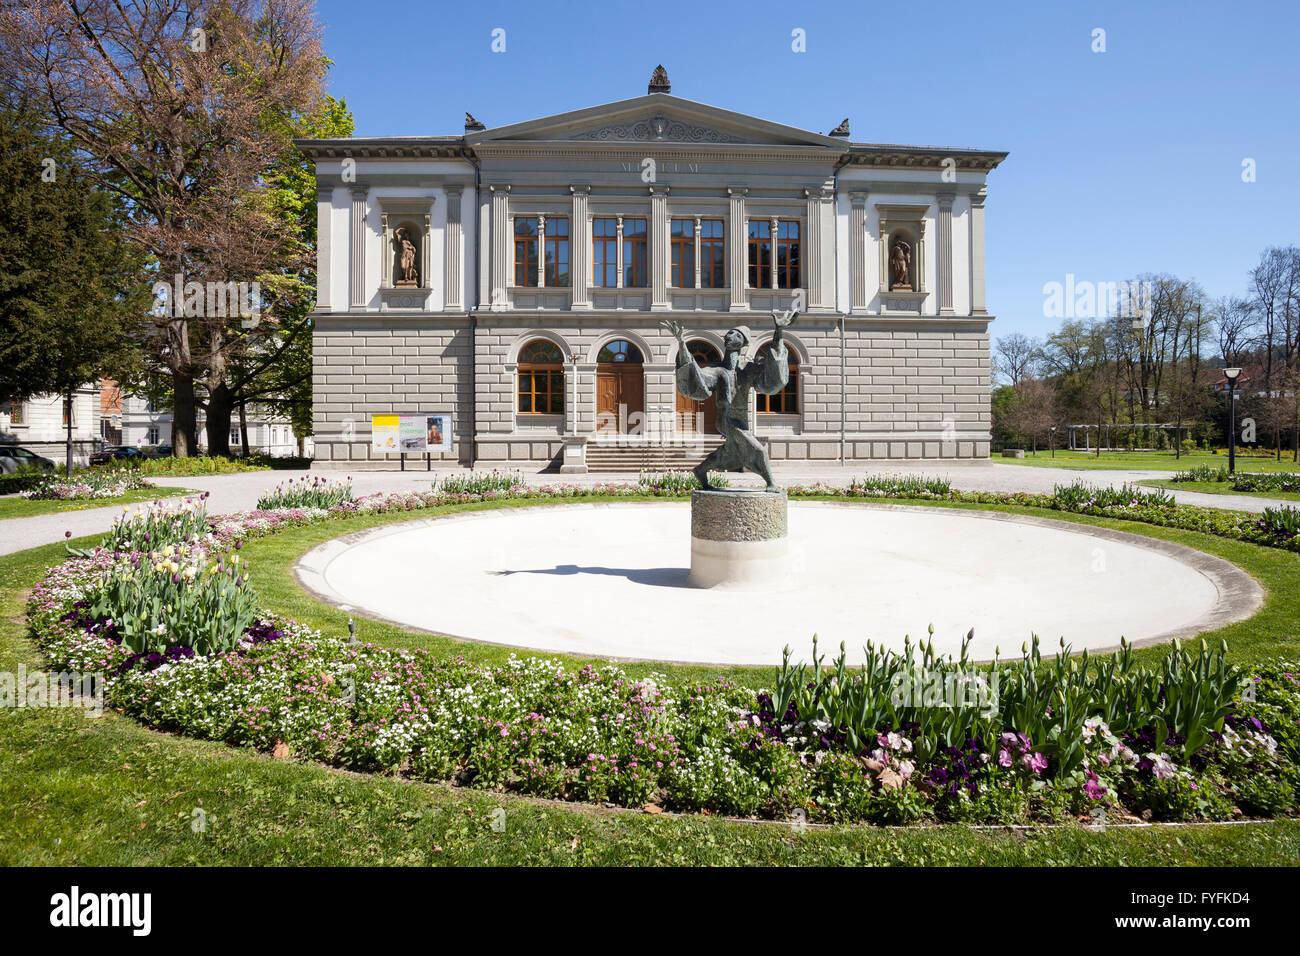 Natural History and Art Museum, St. Gallen, Canton of St. Gallen, Switzerland - Stock Image